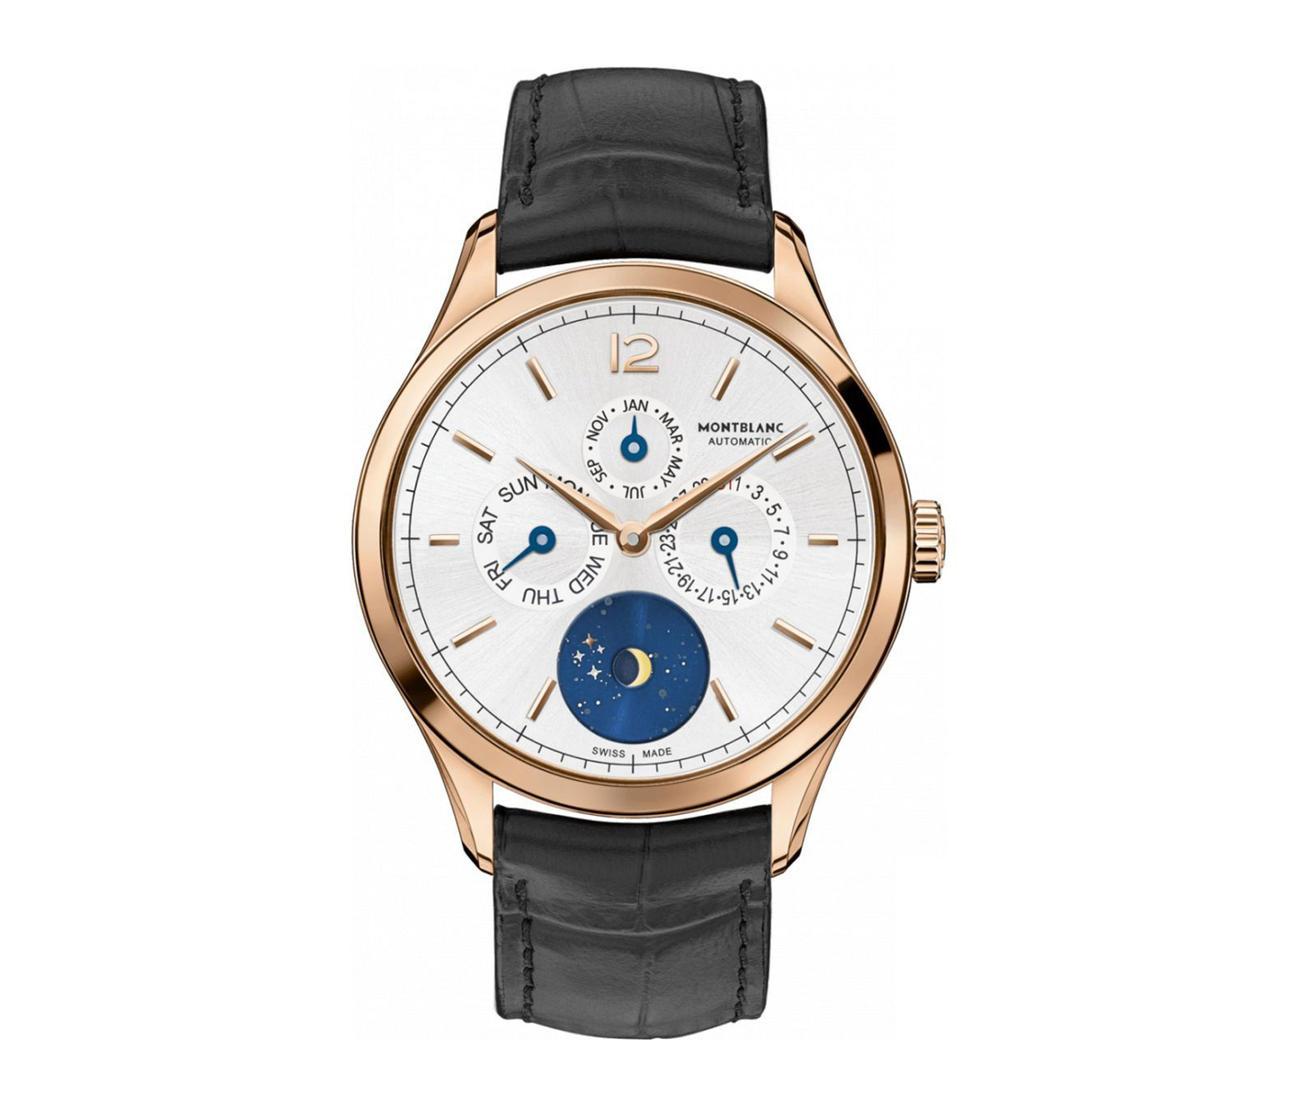 Heritage Chronometrie